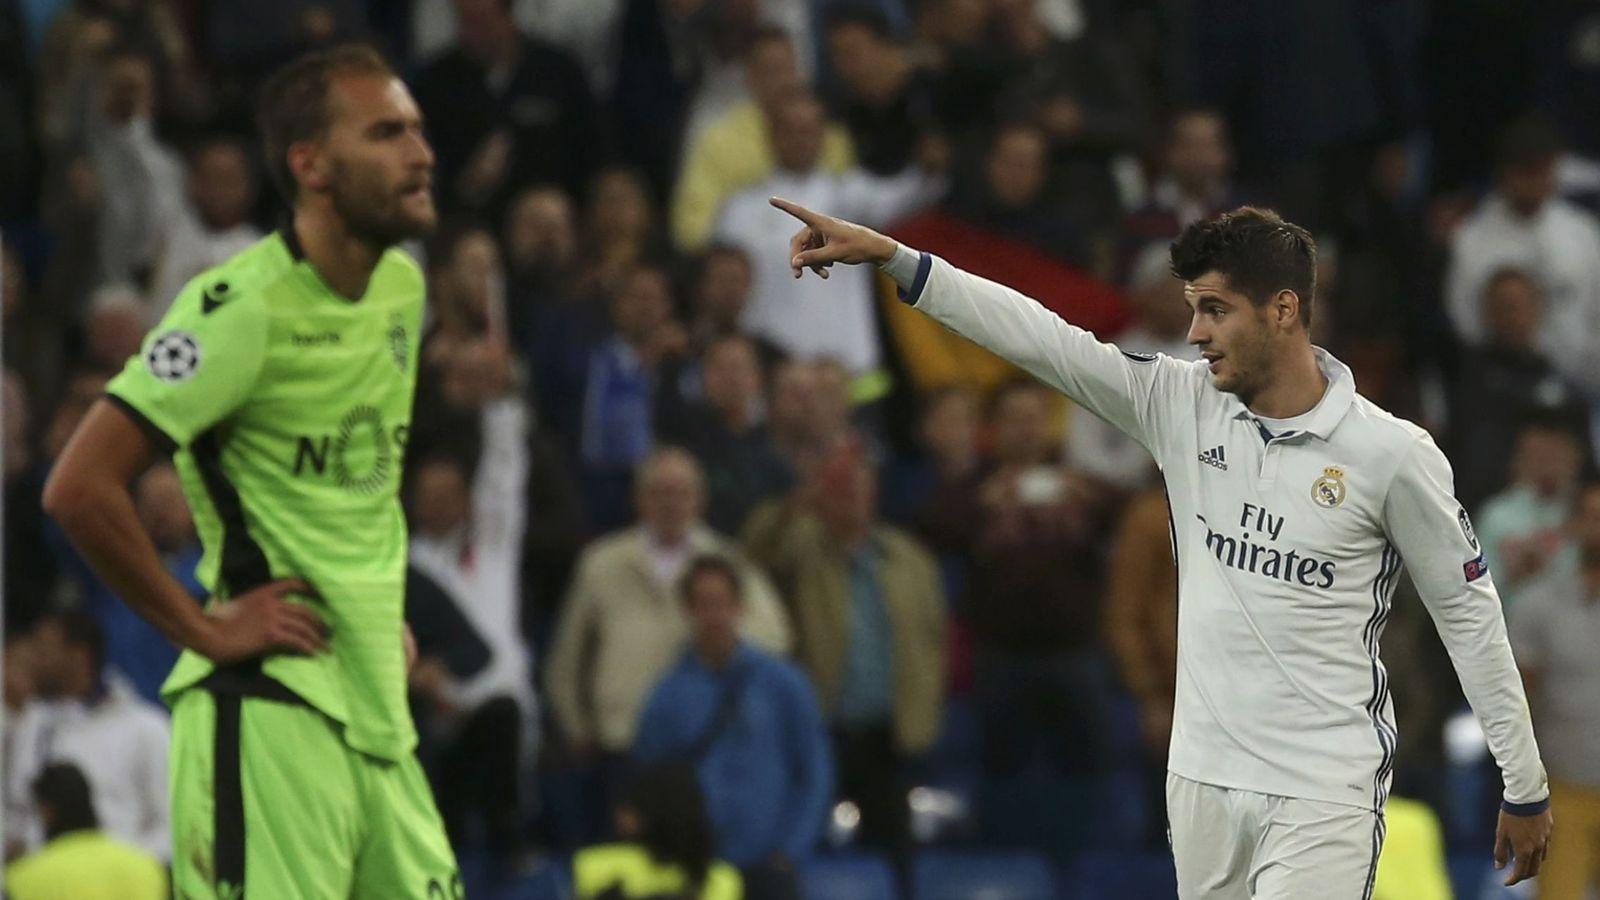 Foto: Morata celebra su gol al Sporting de Portugal en la Champions. (REUTERS)